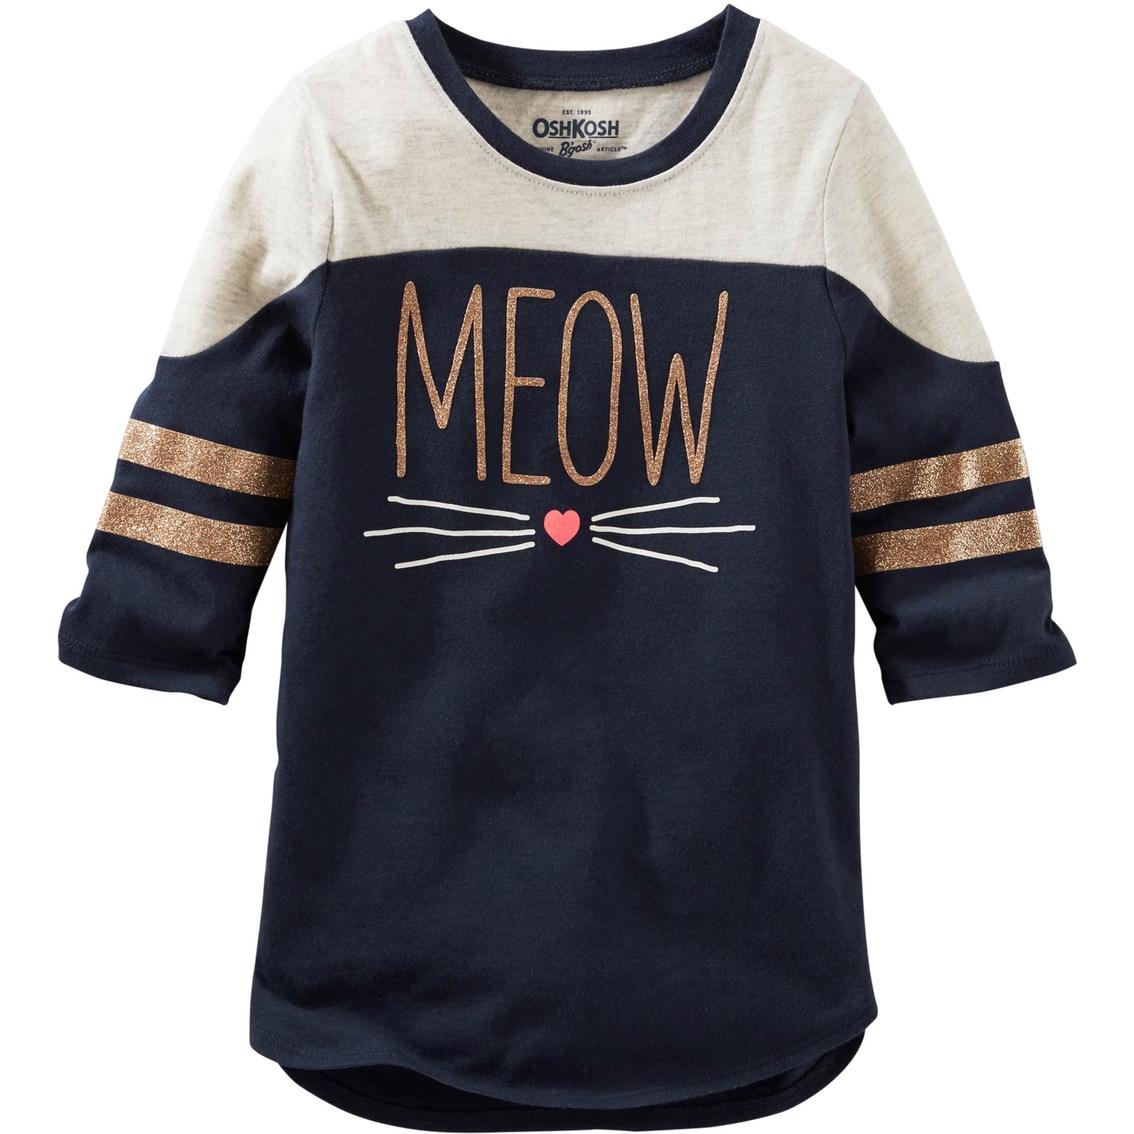 Oshkosh B\'gosh Girls Meow Tunic | Girls 7-16 | Apparel | Shop The ...